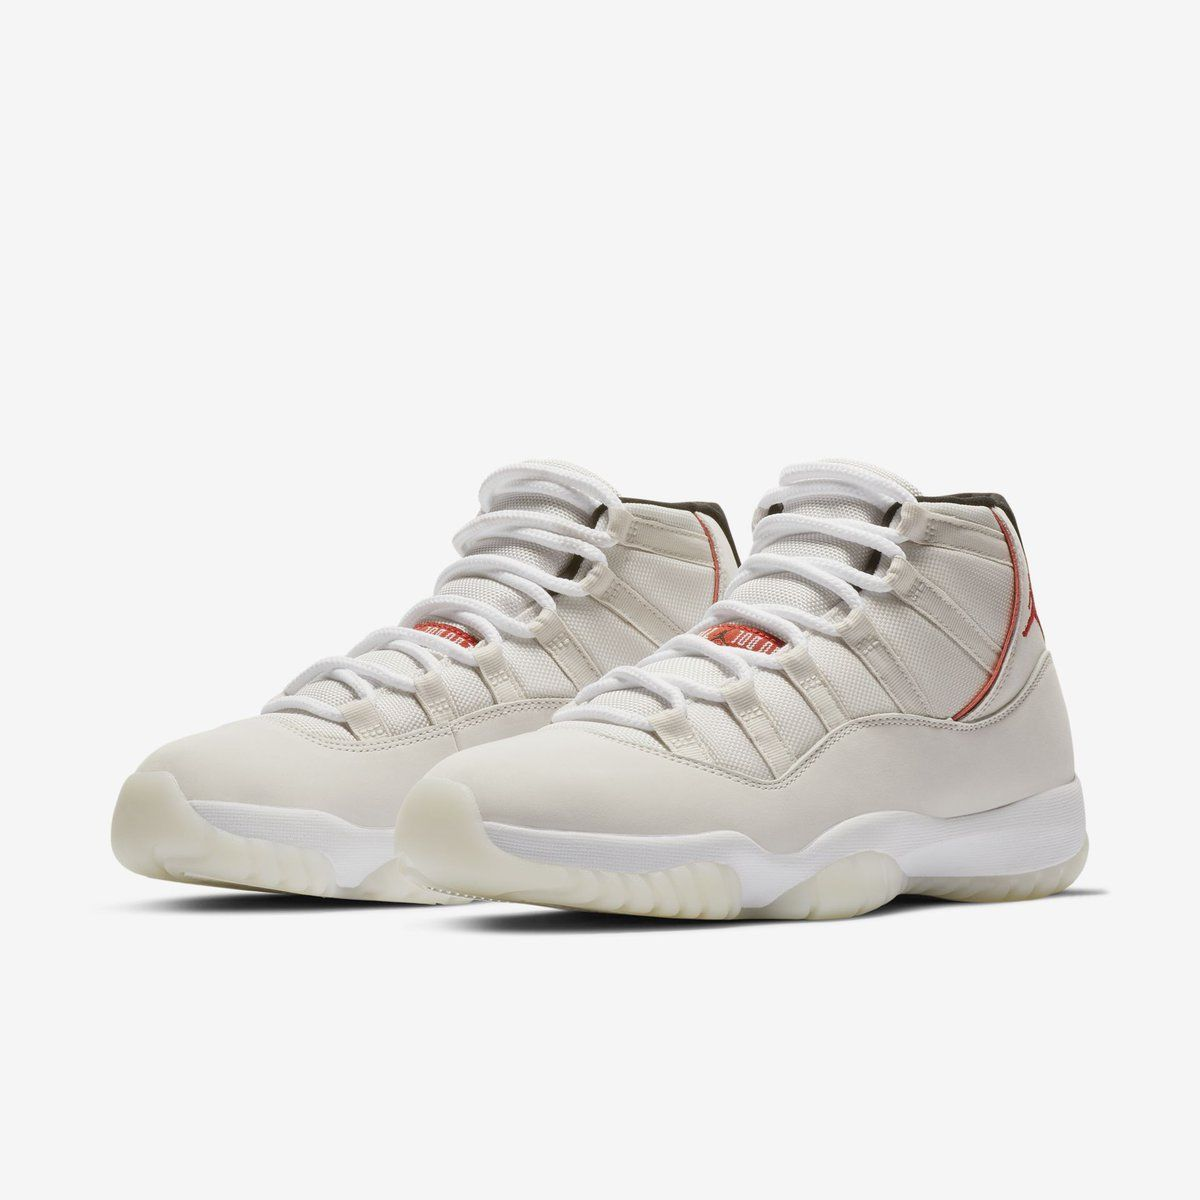 21165a2f39d59 Air Jordan 11 Platinum Tint 378037-016